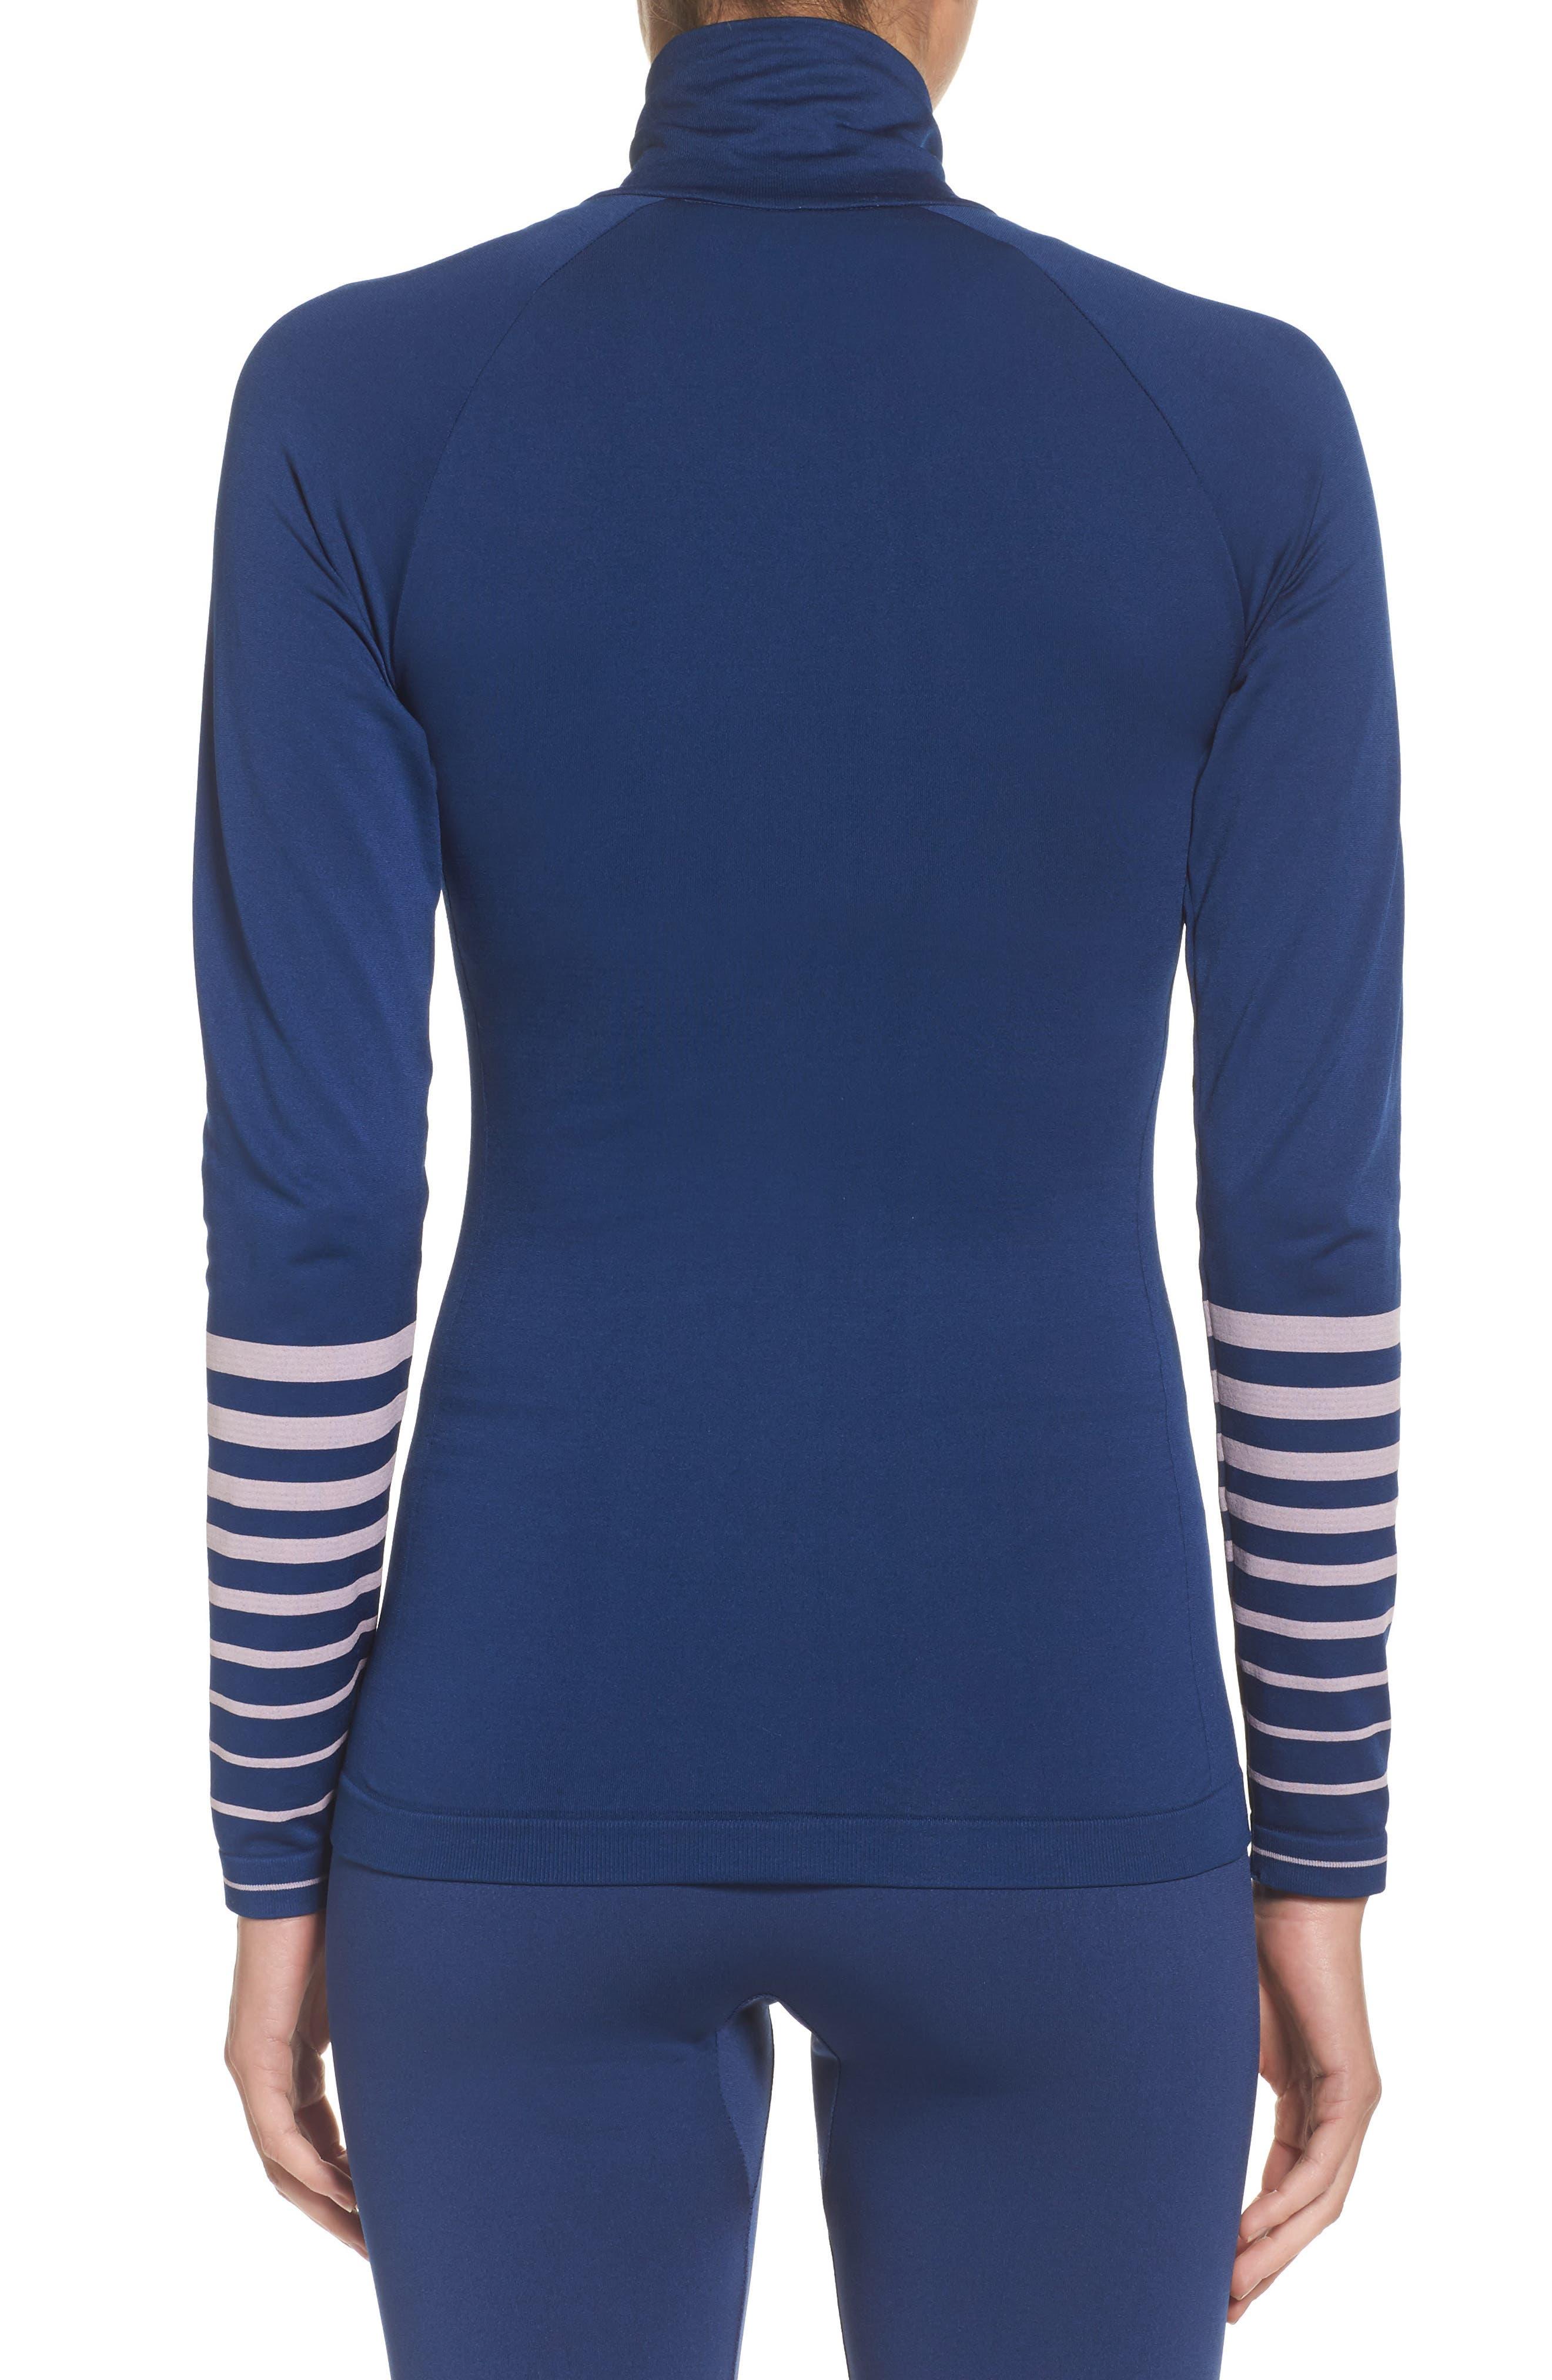 Finish Line Training Jacket,                             Alternate thumbnail 2, color,                             Estate Blue And Crystal Pink